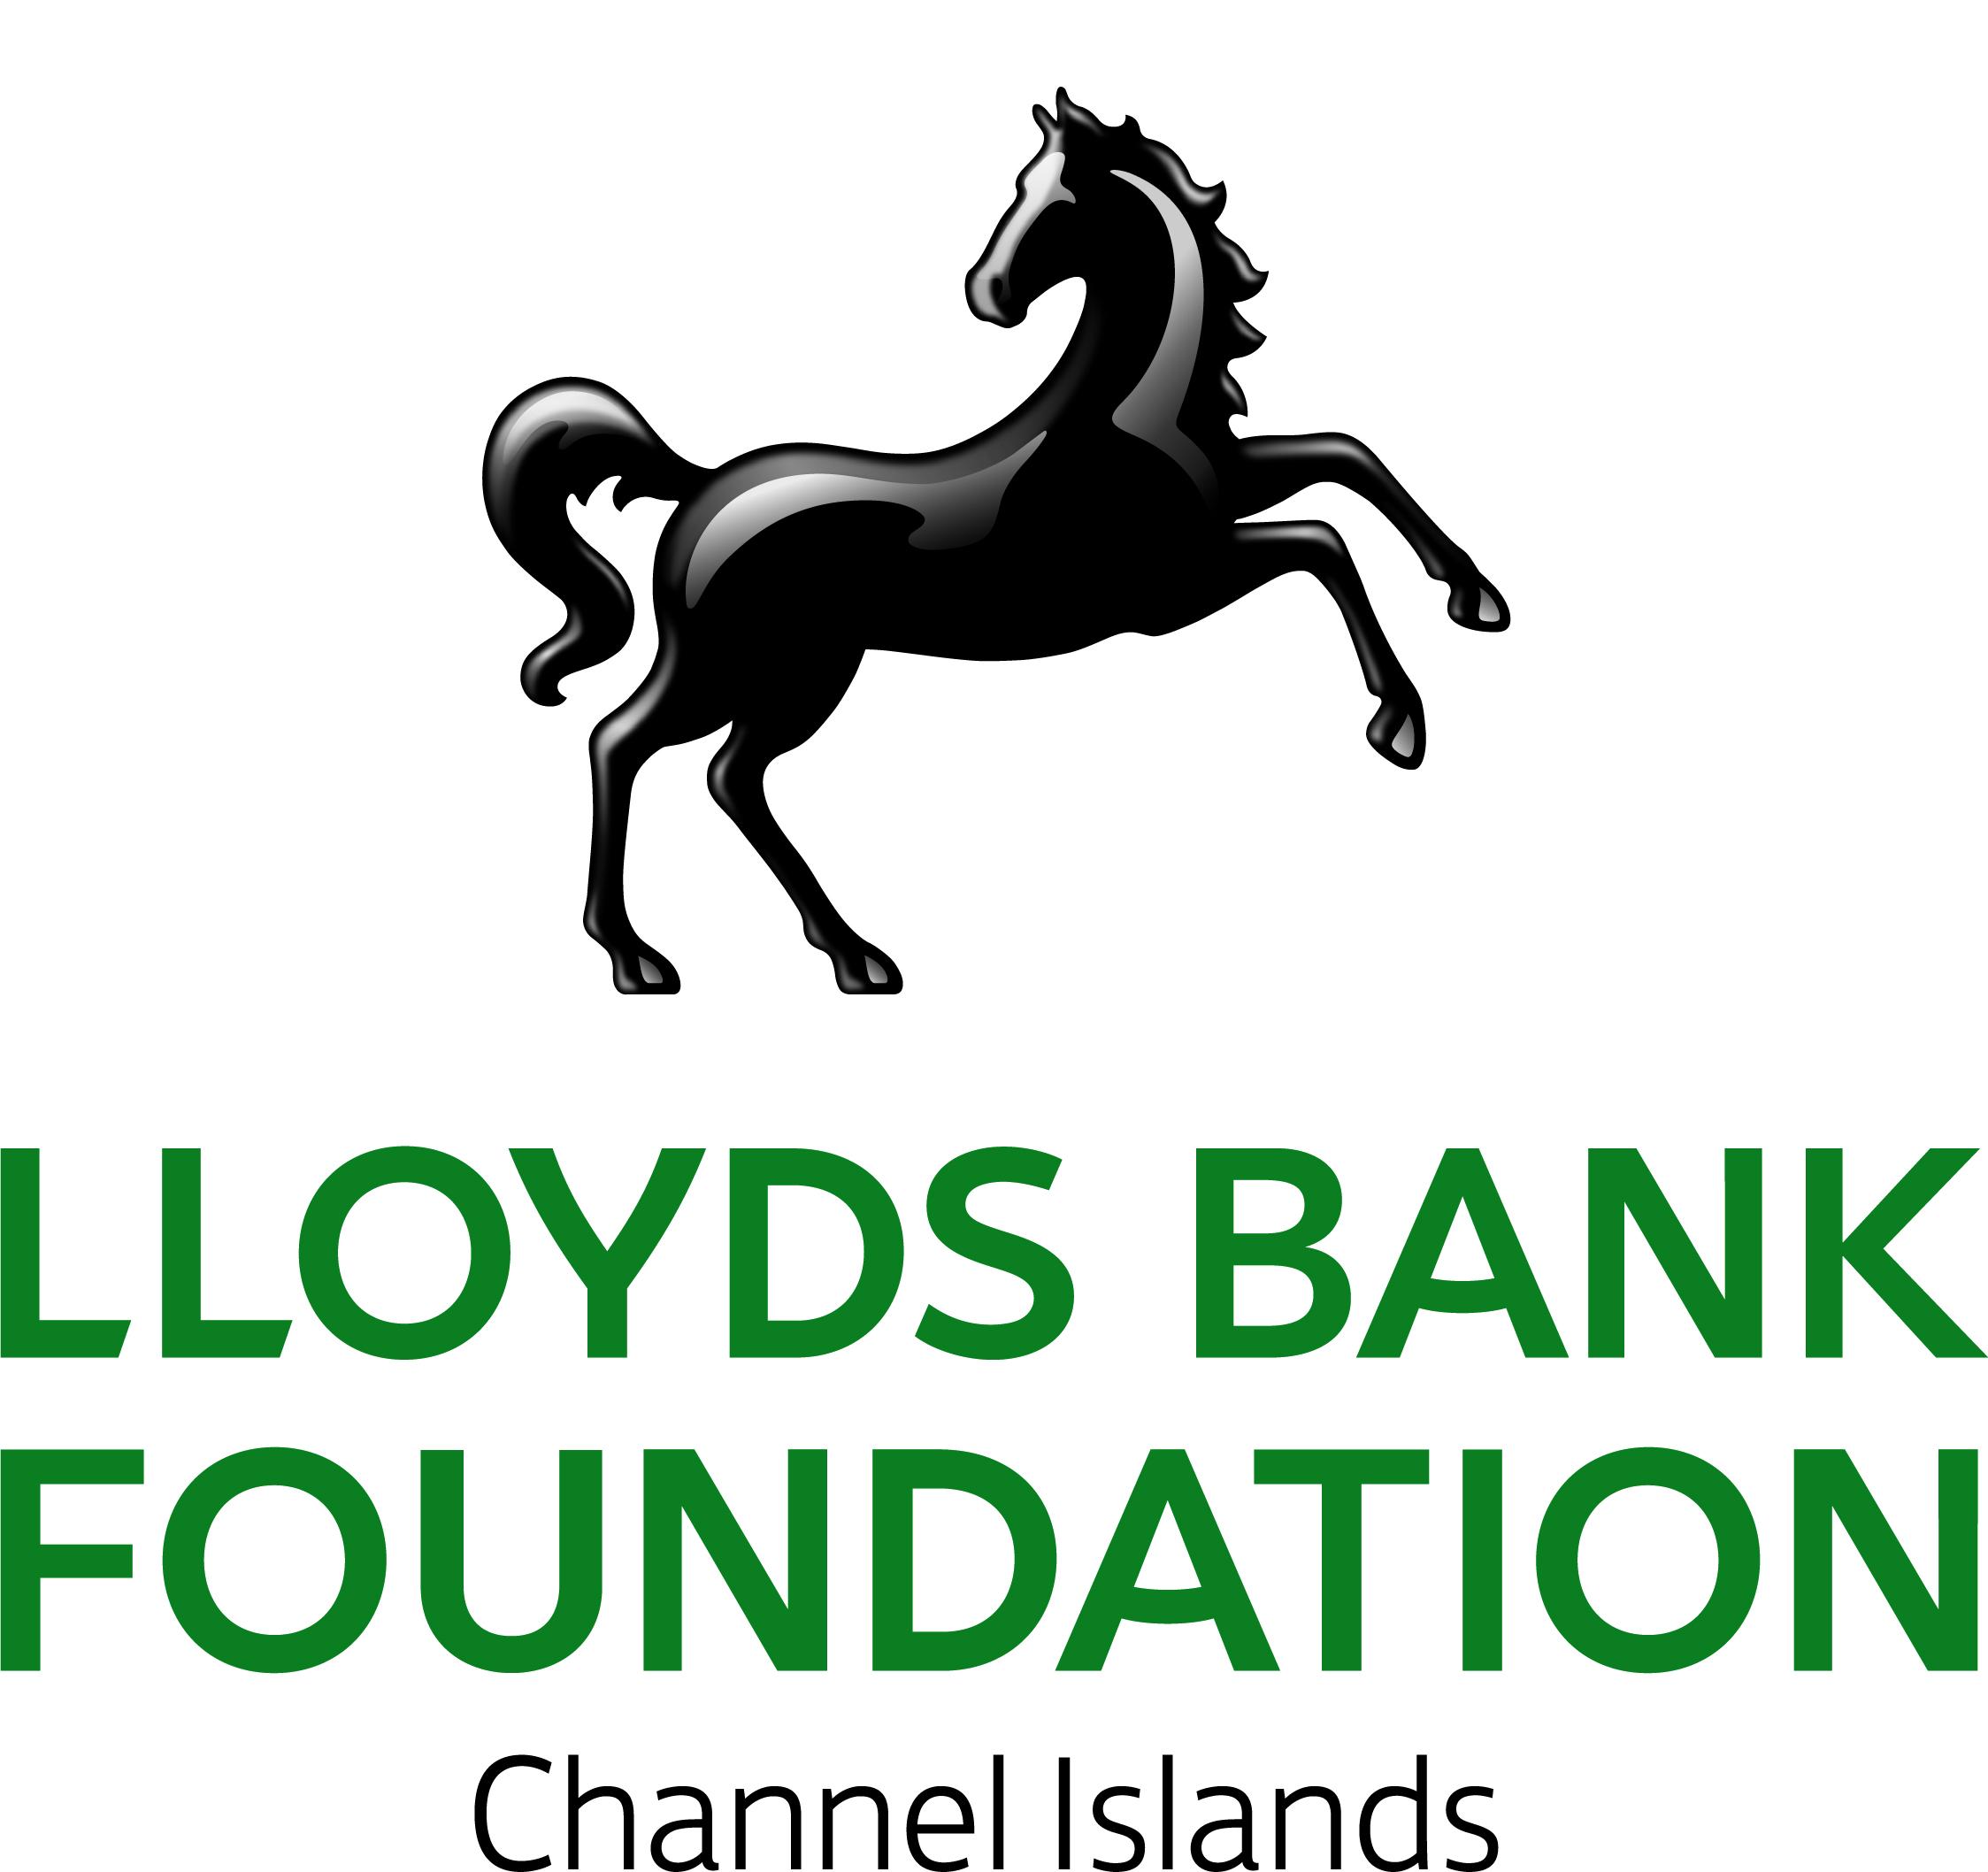 Lloyds Bank Foundation CI